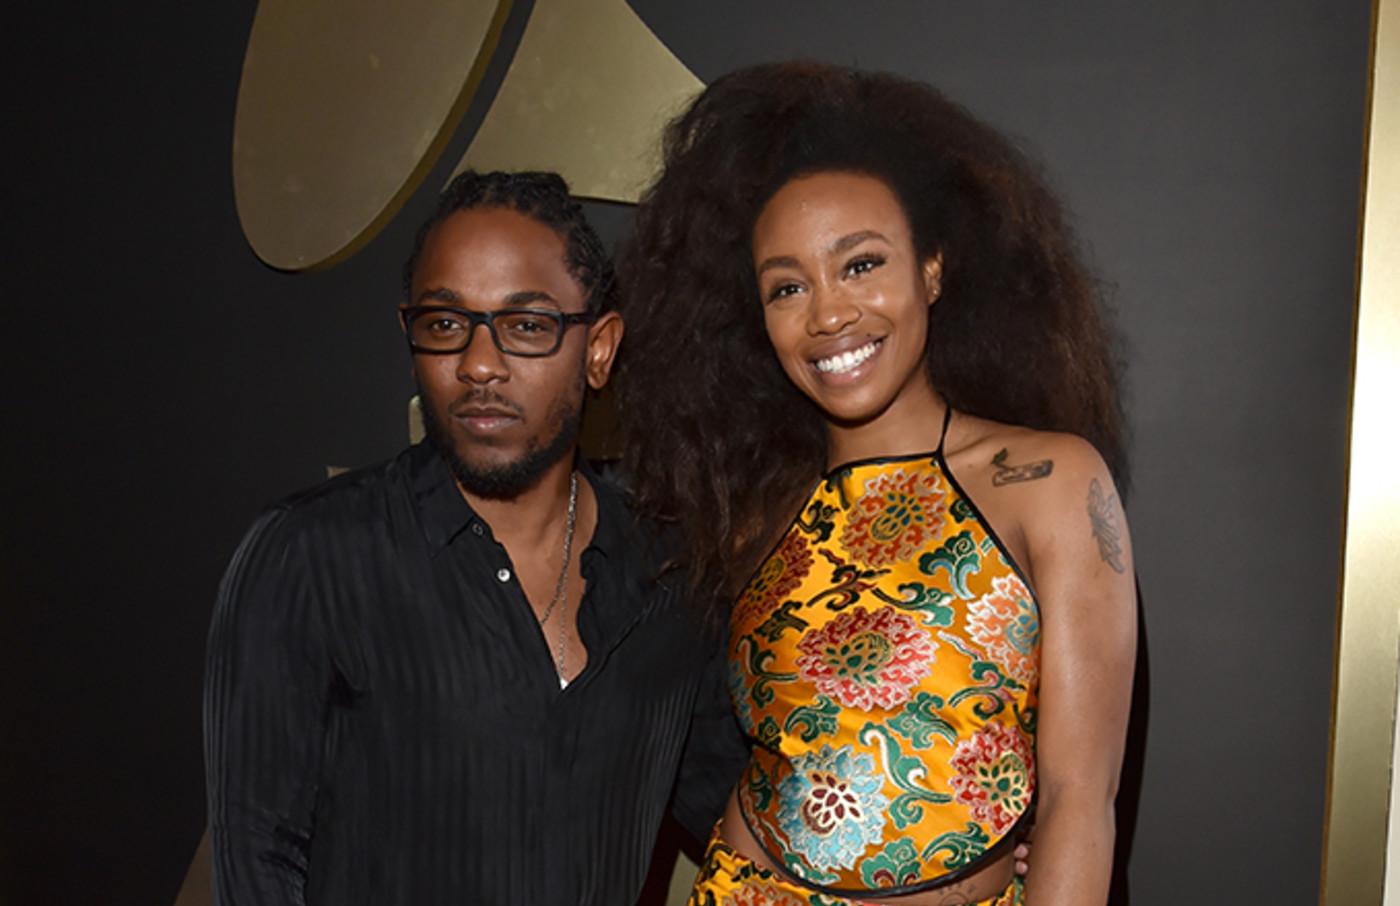 SZA and Kendrick